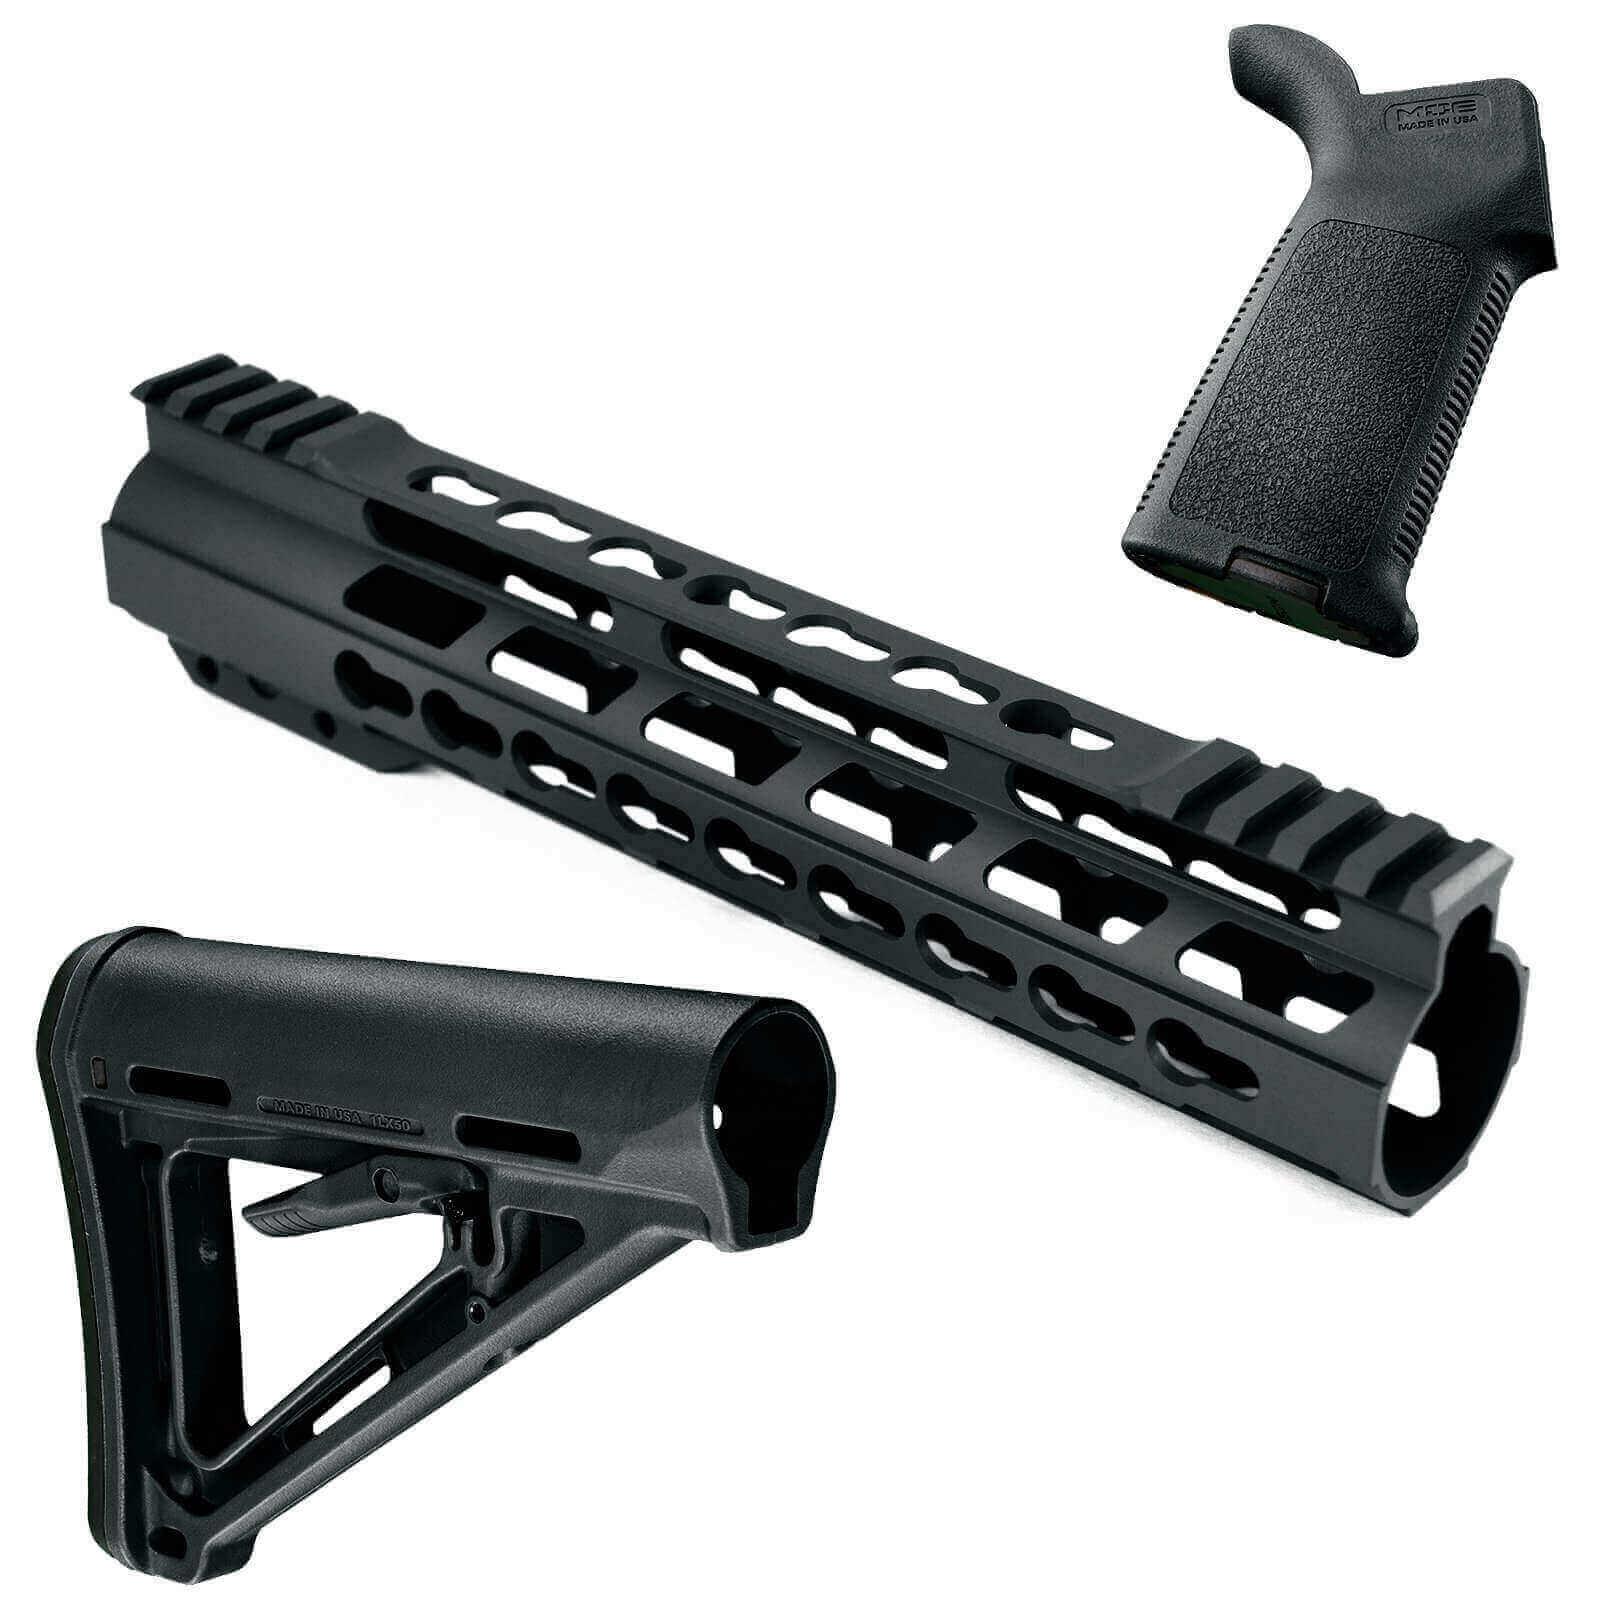 At3 Promod K Furniture Kit At3 Keymod Handguard Magpul Stock Grip